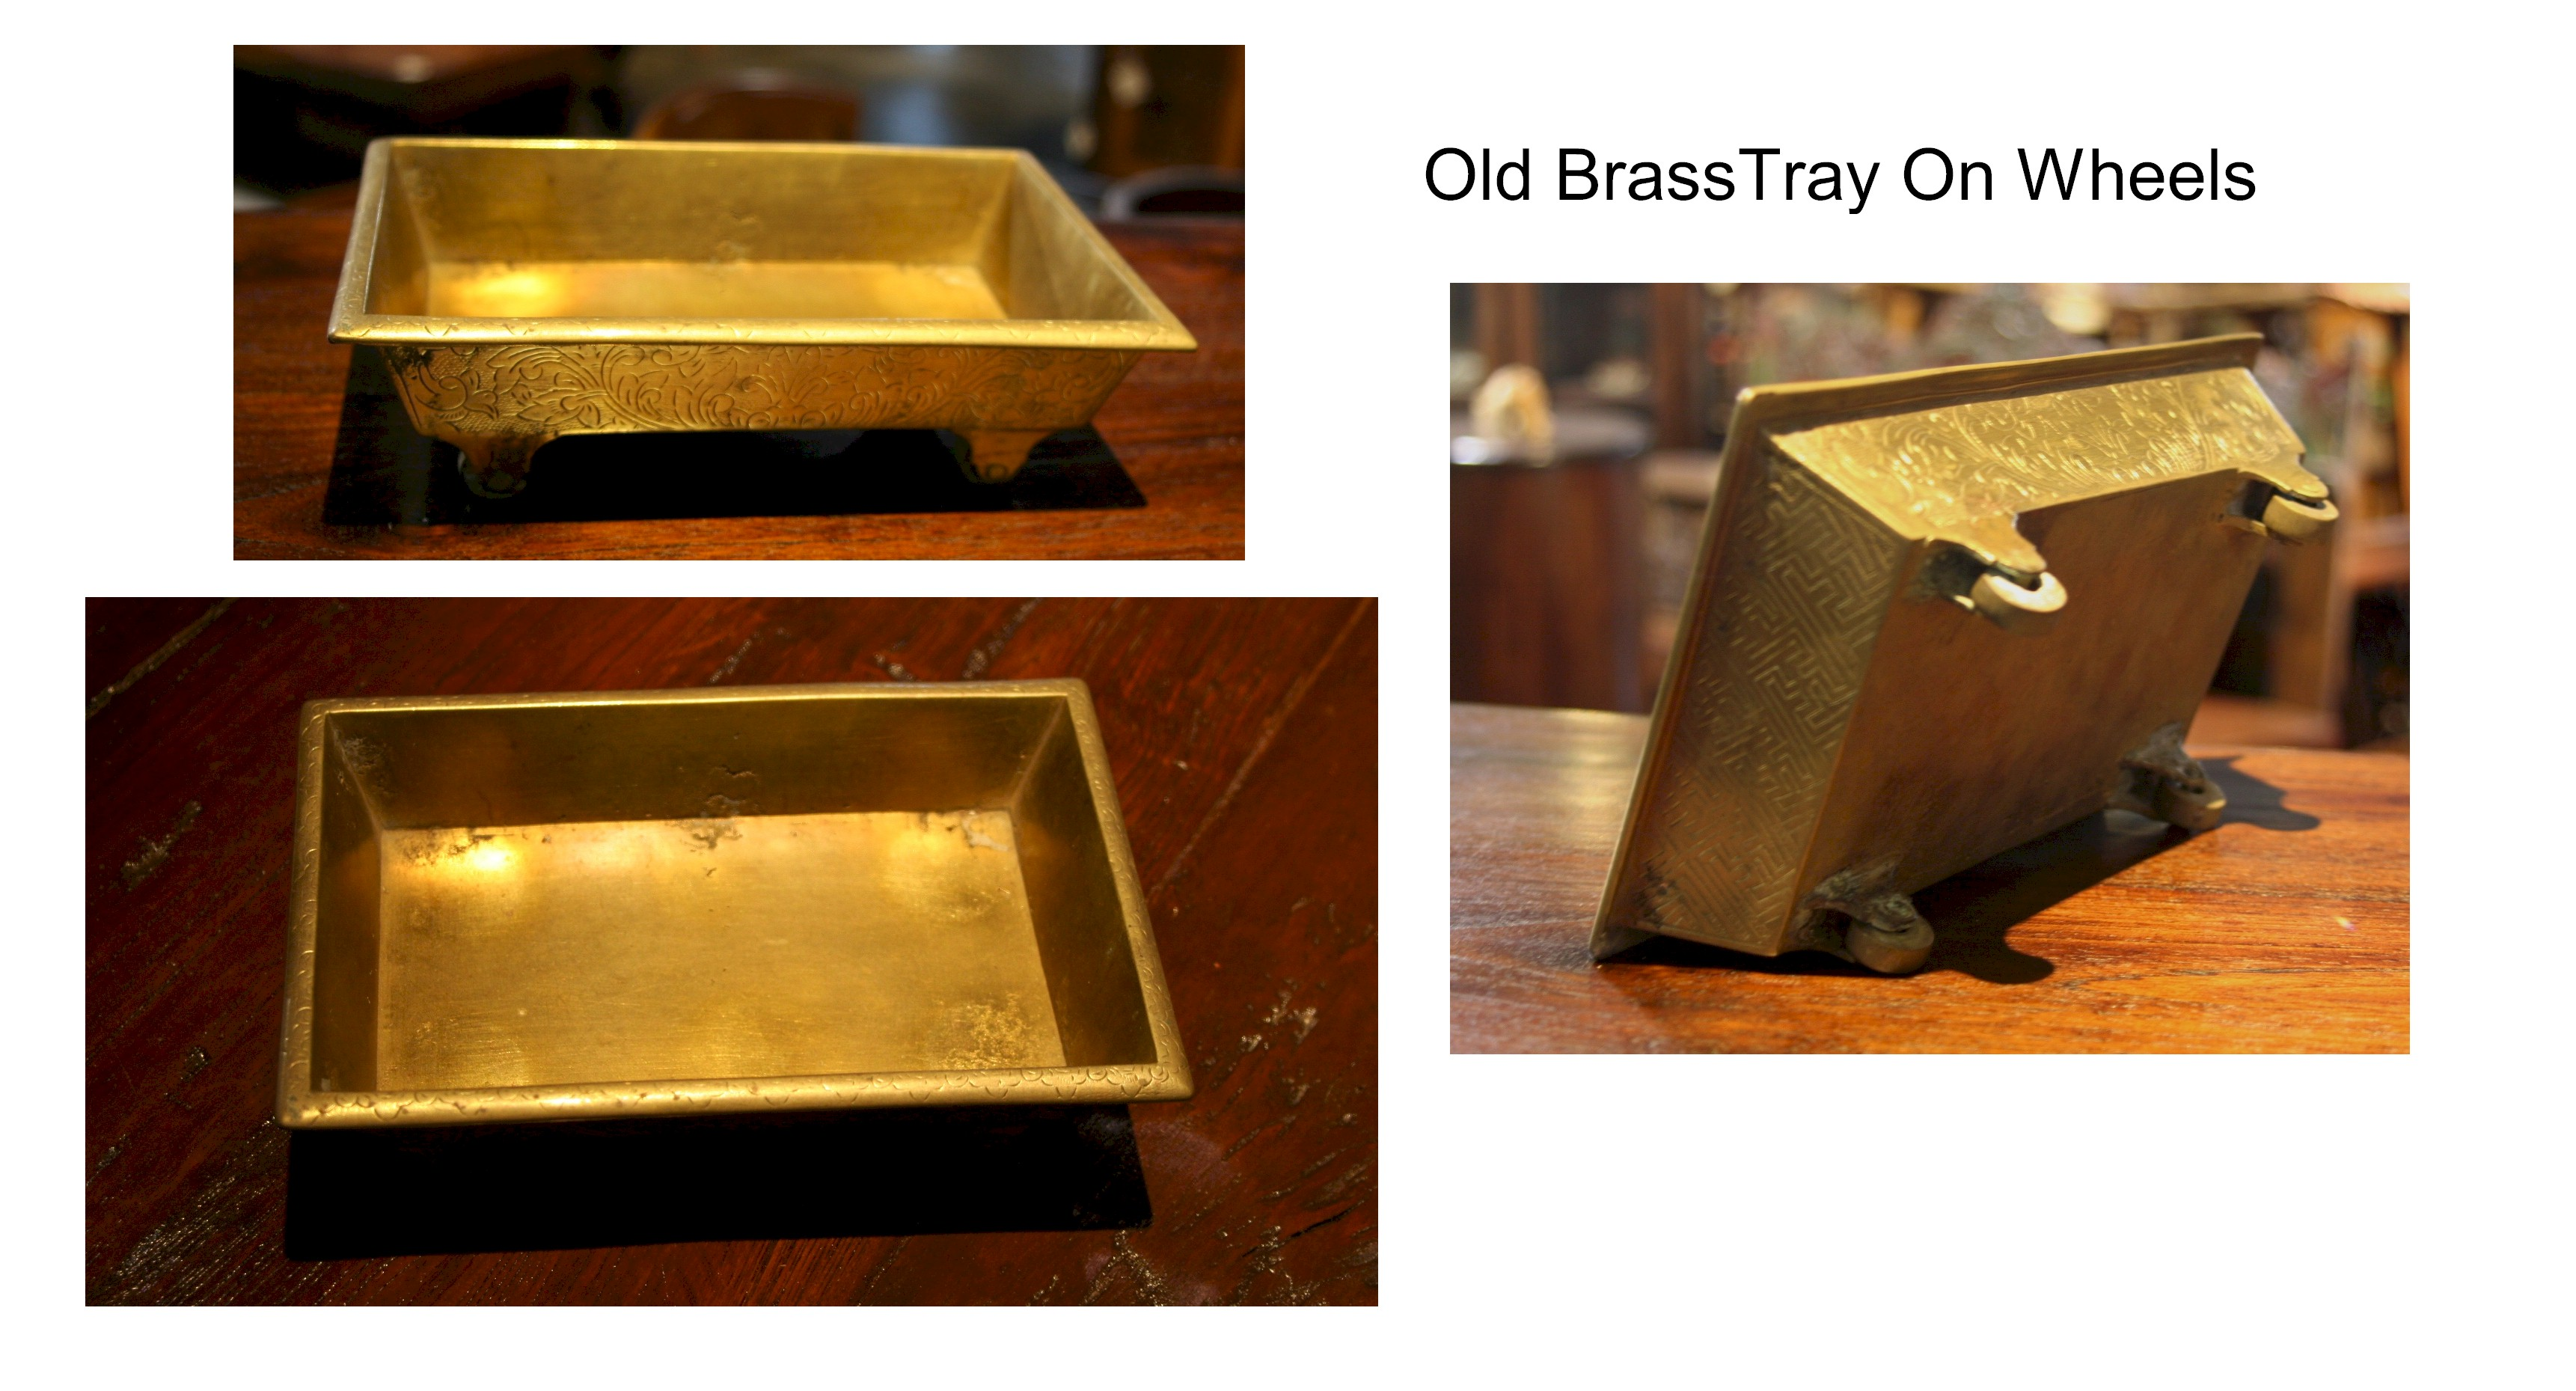 Old BrassTray On Wheels